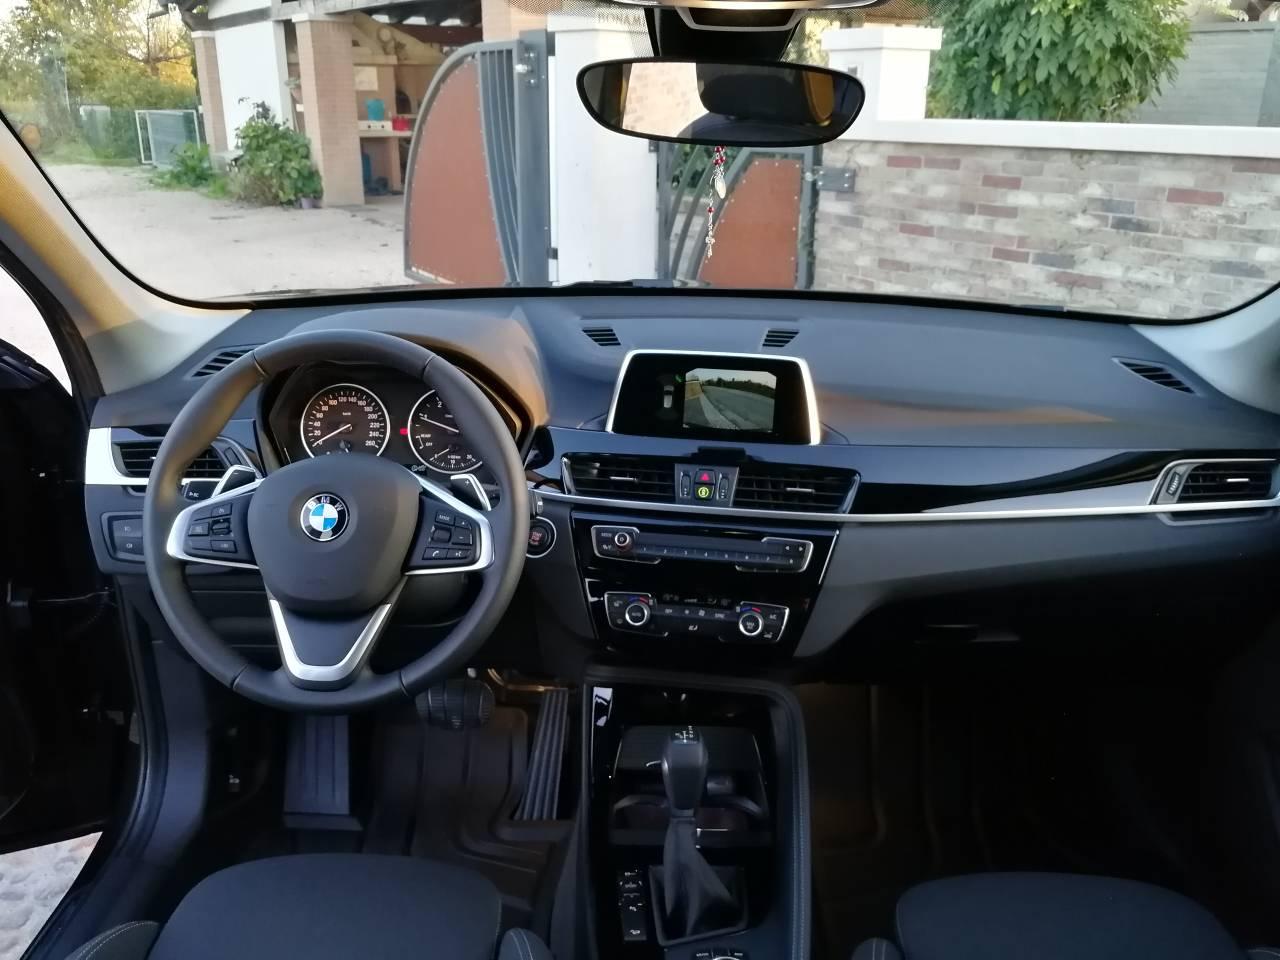 Bbriccardo - BMW X1 25D, appena uscita dalla concessionaria :)  A35251ebca00088ba95aec27965ac7fc